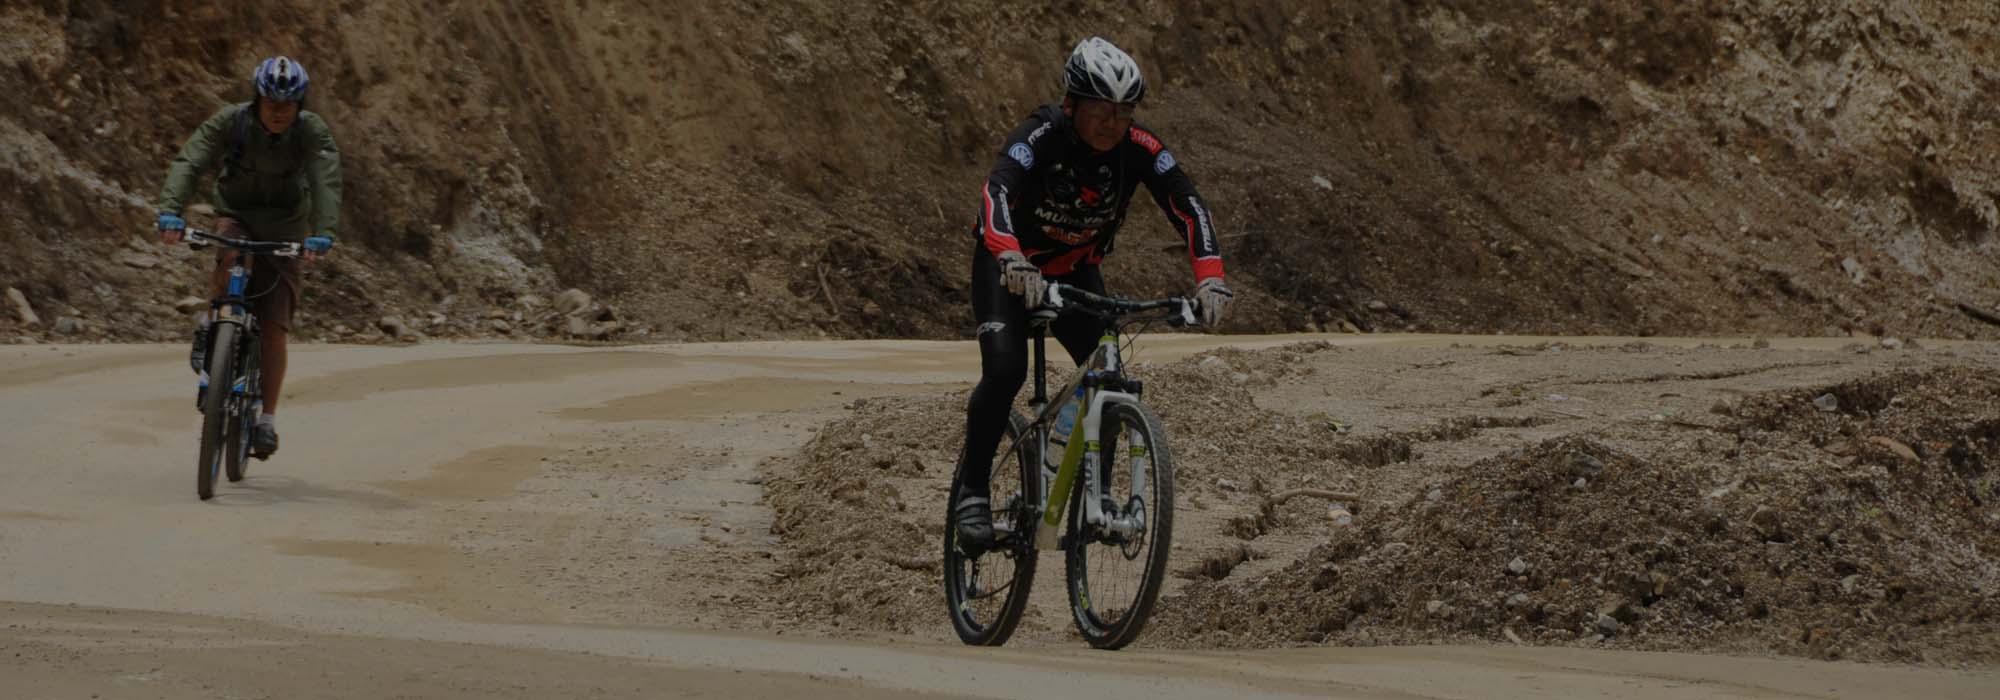 Central Bhutan Bicycle Tour